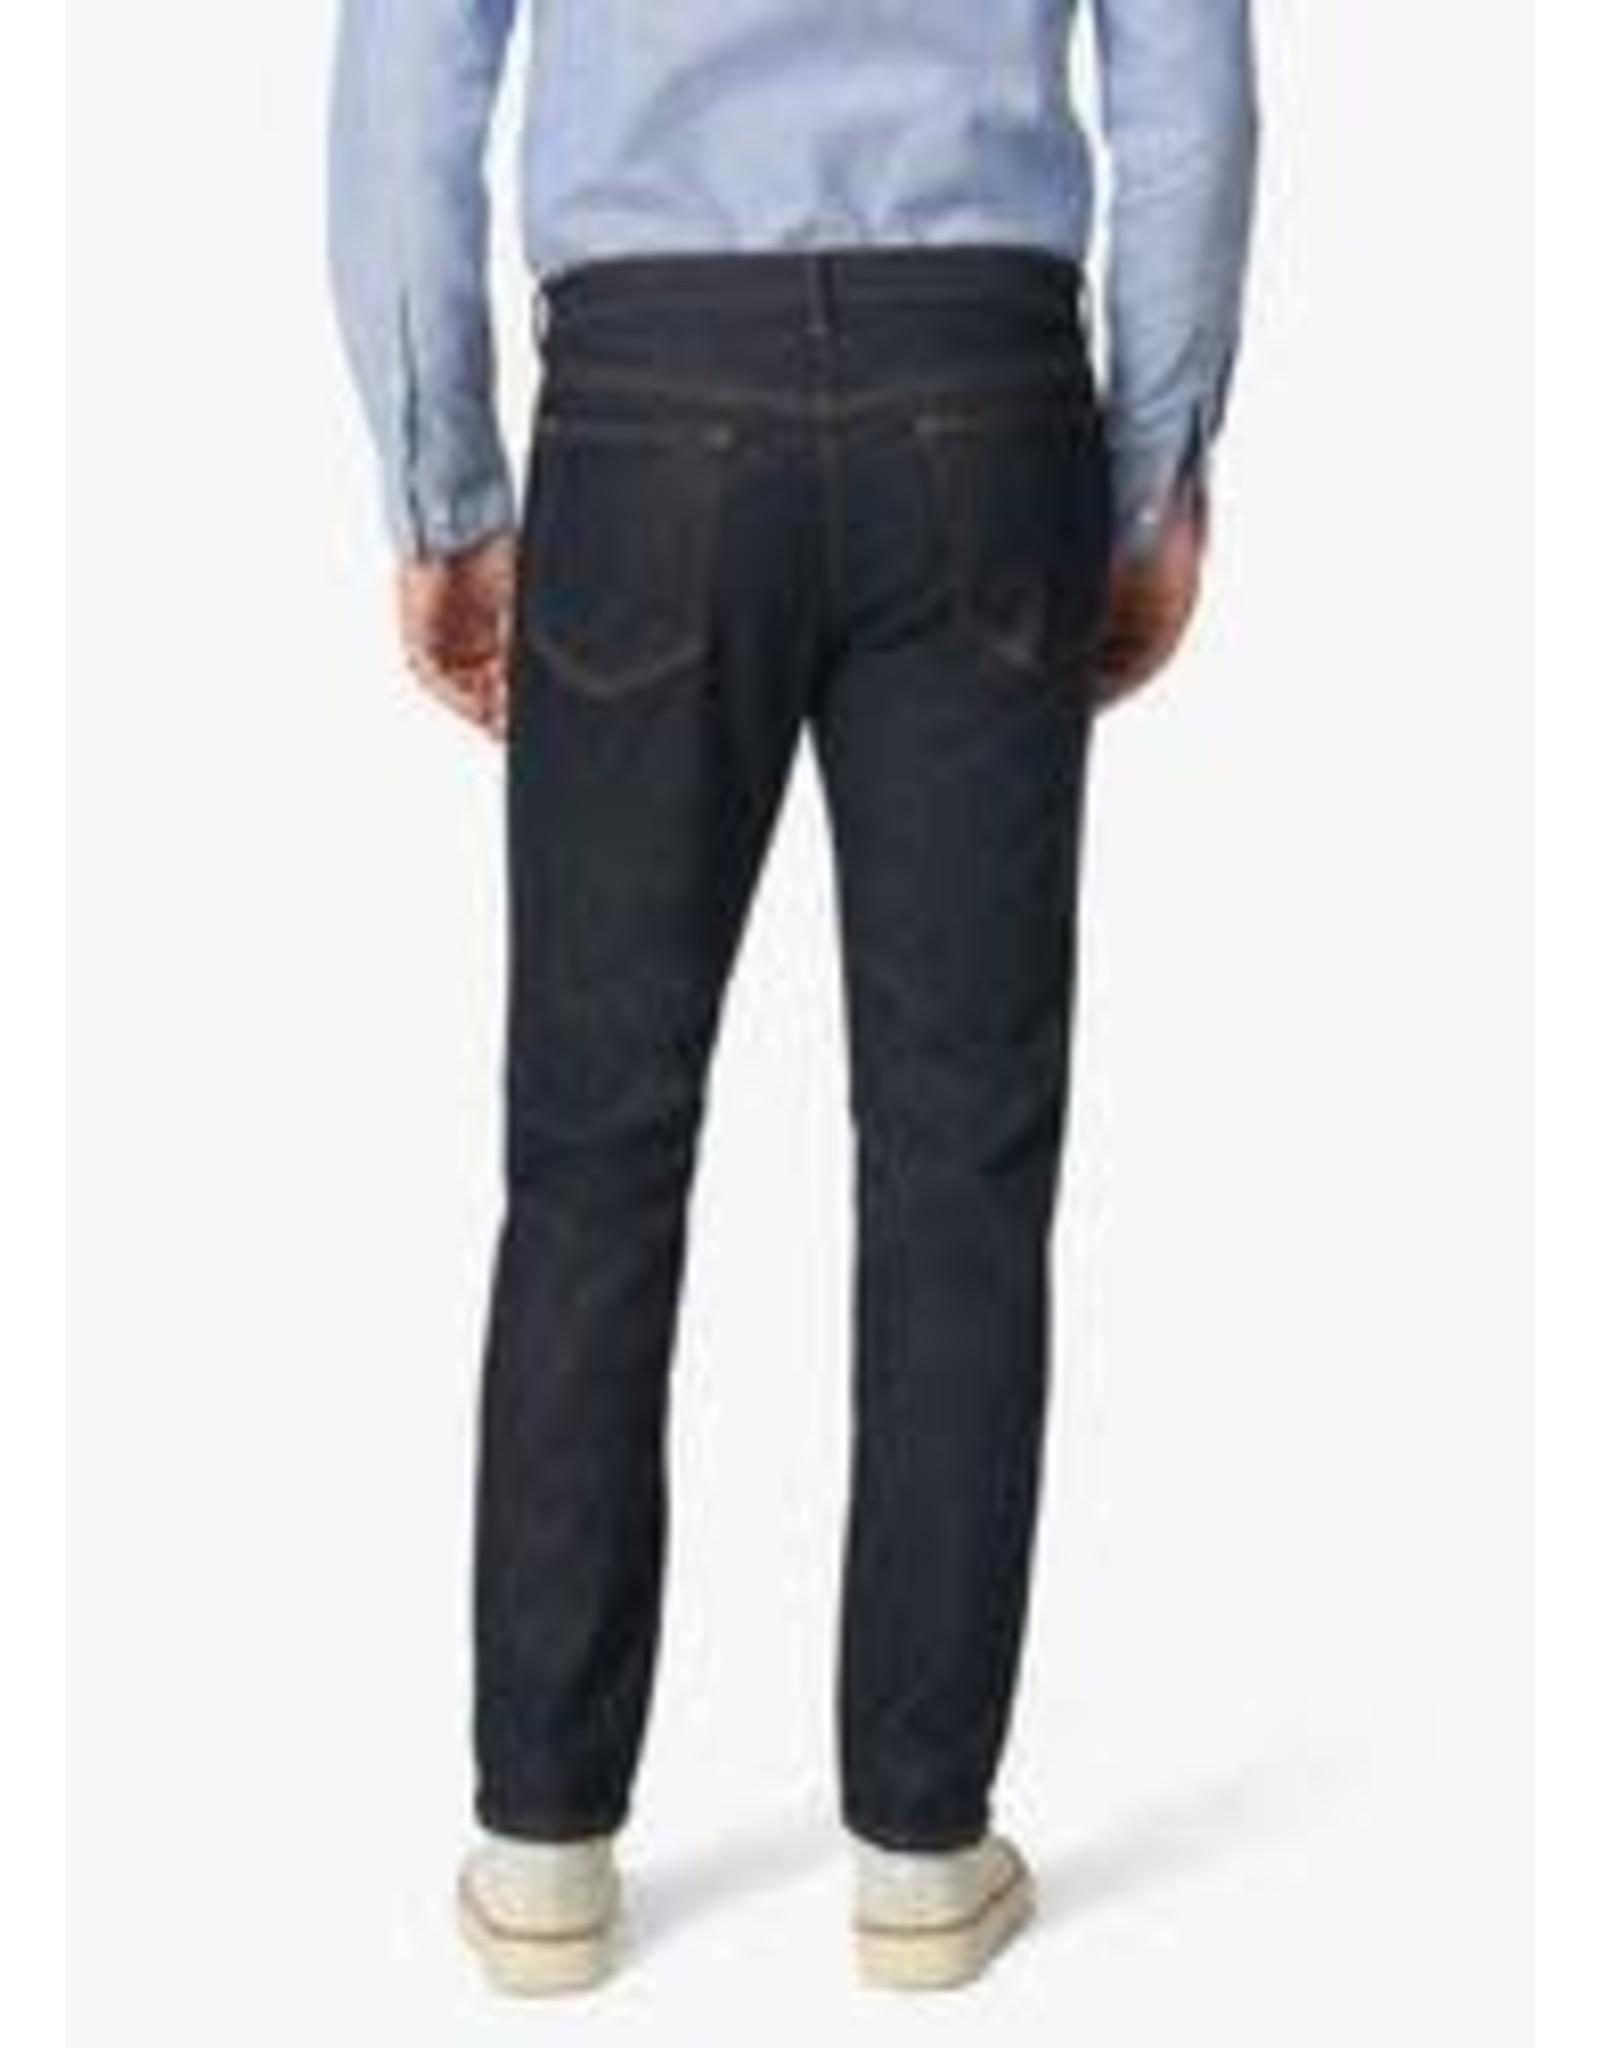 Joes Jeans Mens Asher Jean Medlin